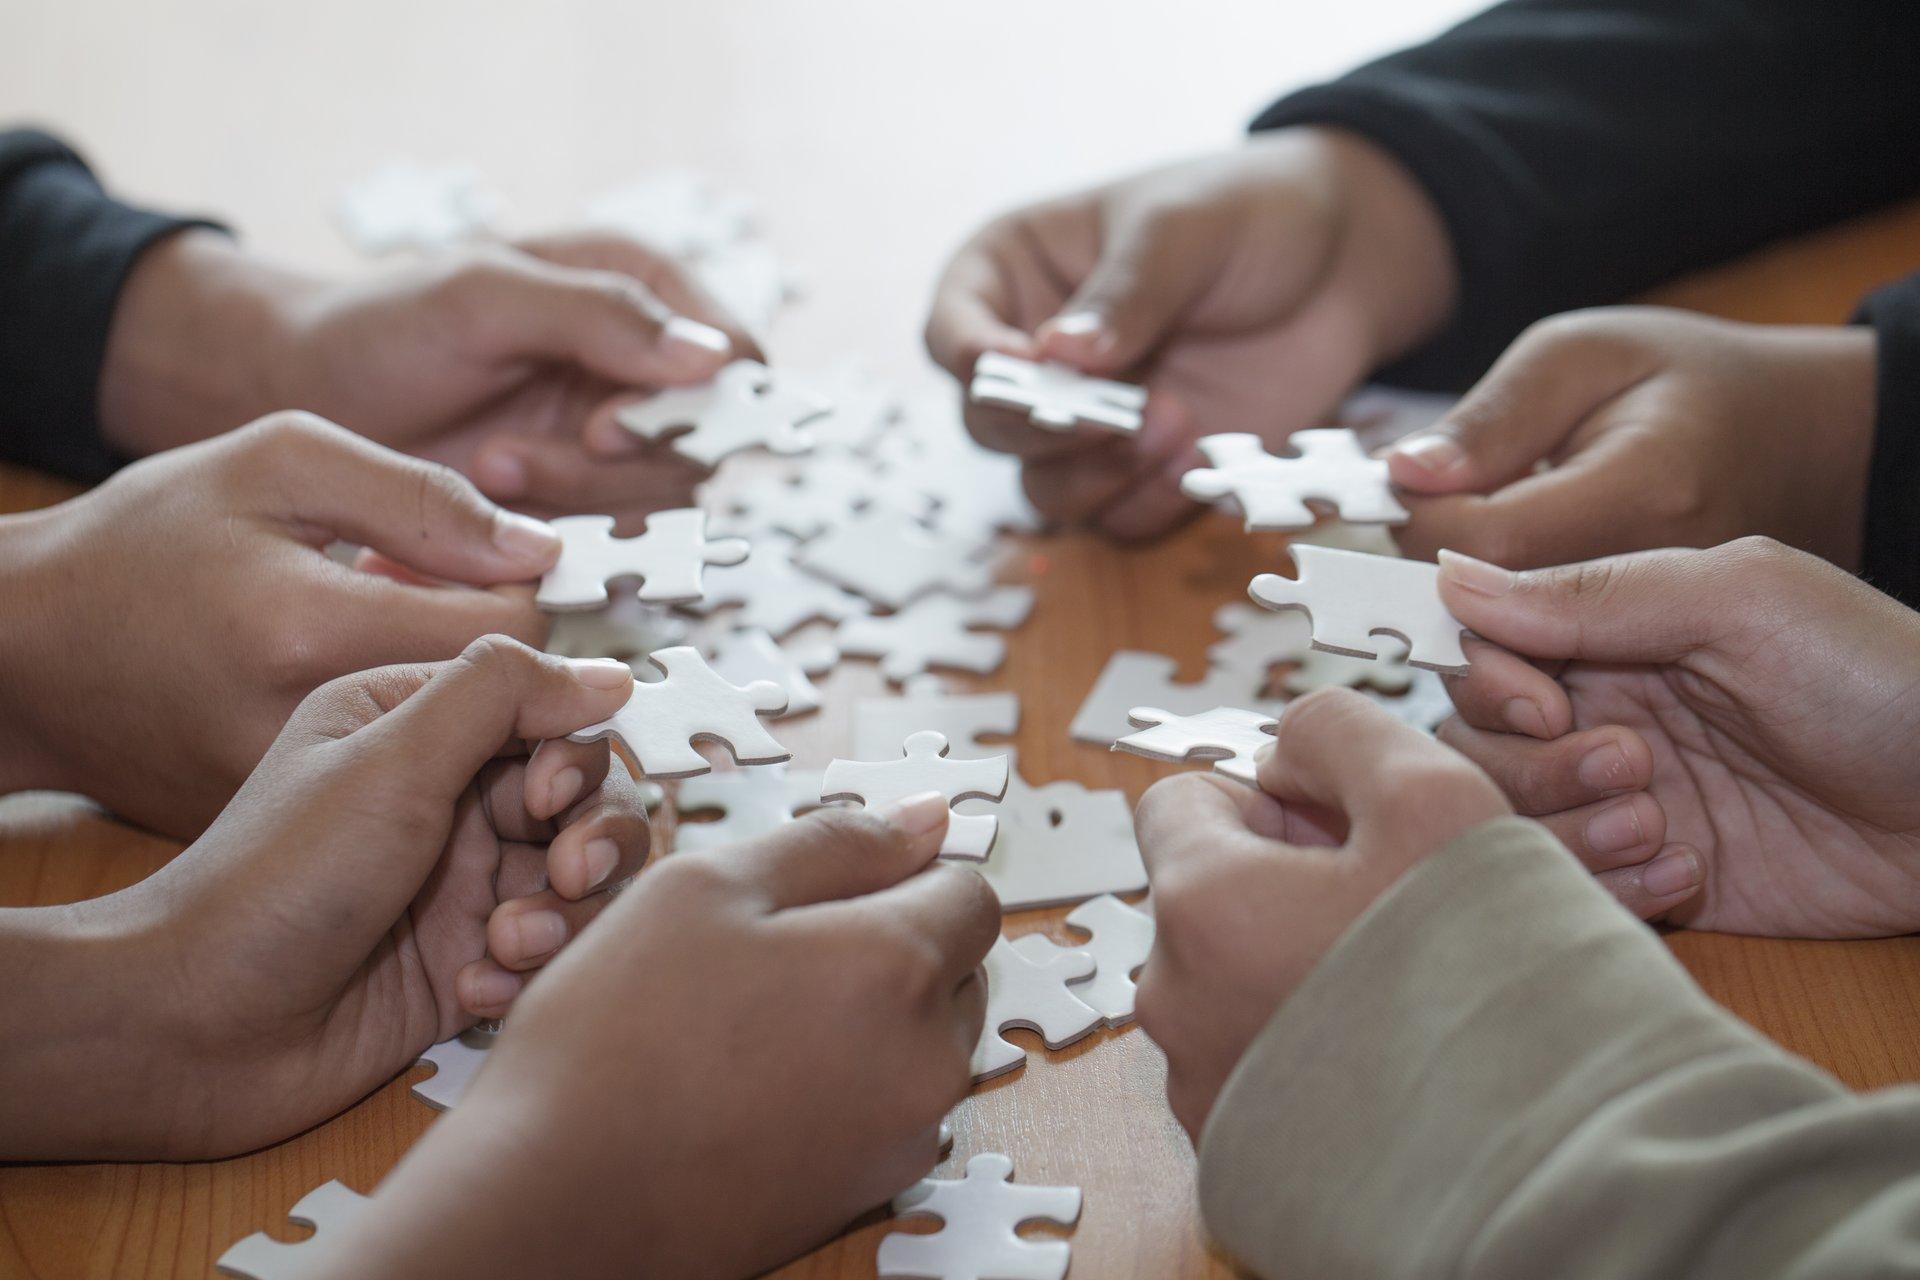 Jig Saw Puzzle Crowdfunding